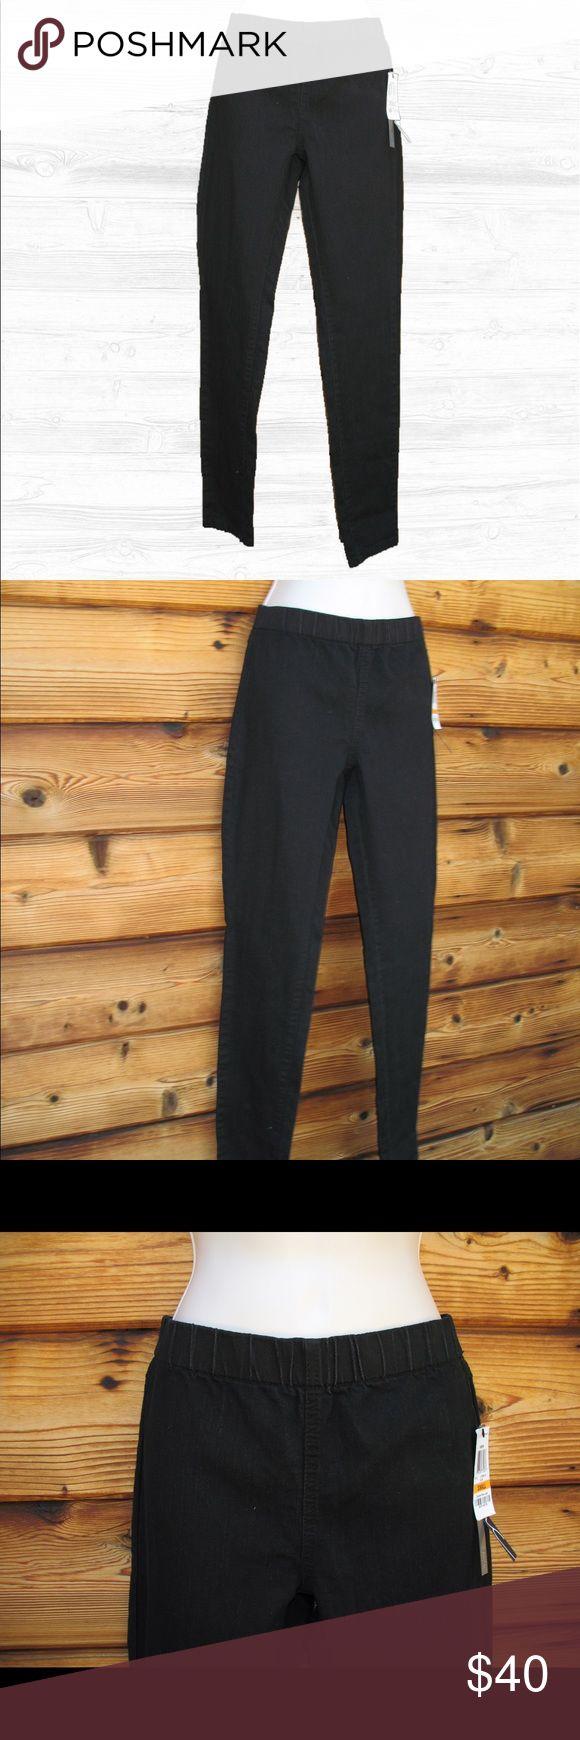 "🆕 International Concepts INC Denim Jeggings Pant International Concepts Elastic Waist Skinny Regular Fit Jeggings Pants, Size Small, Black, New with Tags Details: INC Size: Small Color: Black Elastic Waist No pockets 81% Cotton/18% Polyester/1% Spandex  Measurements: Waist: 28-34"" Elastic Hips: 36"" Inseam: 31"" Front Rise: 8.5"" INC International Concepts Pants Leggings"